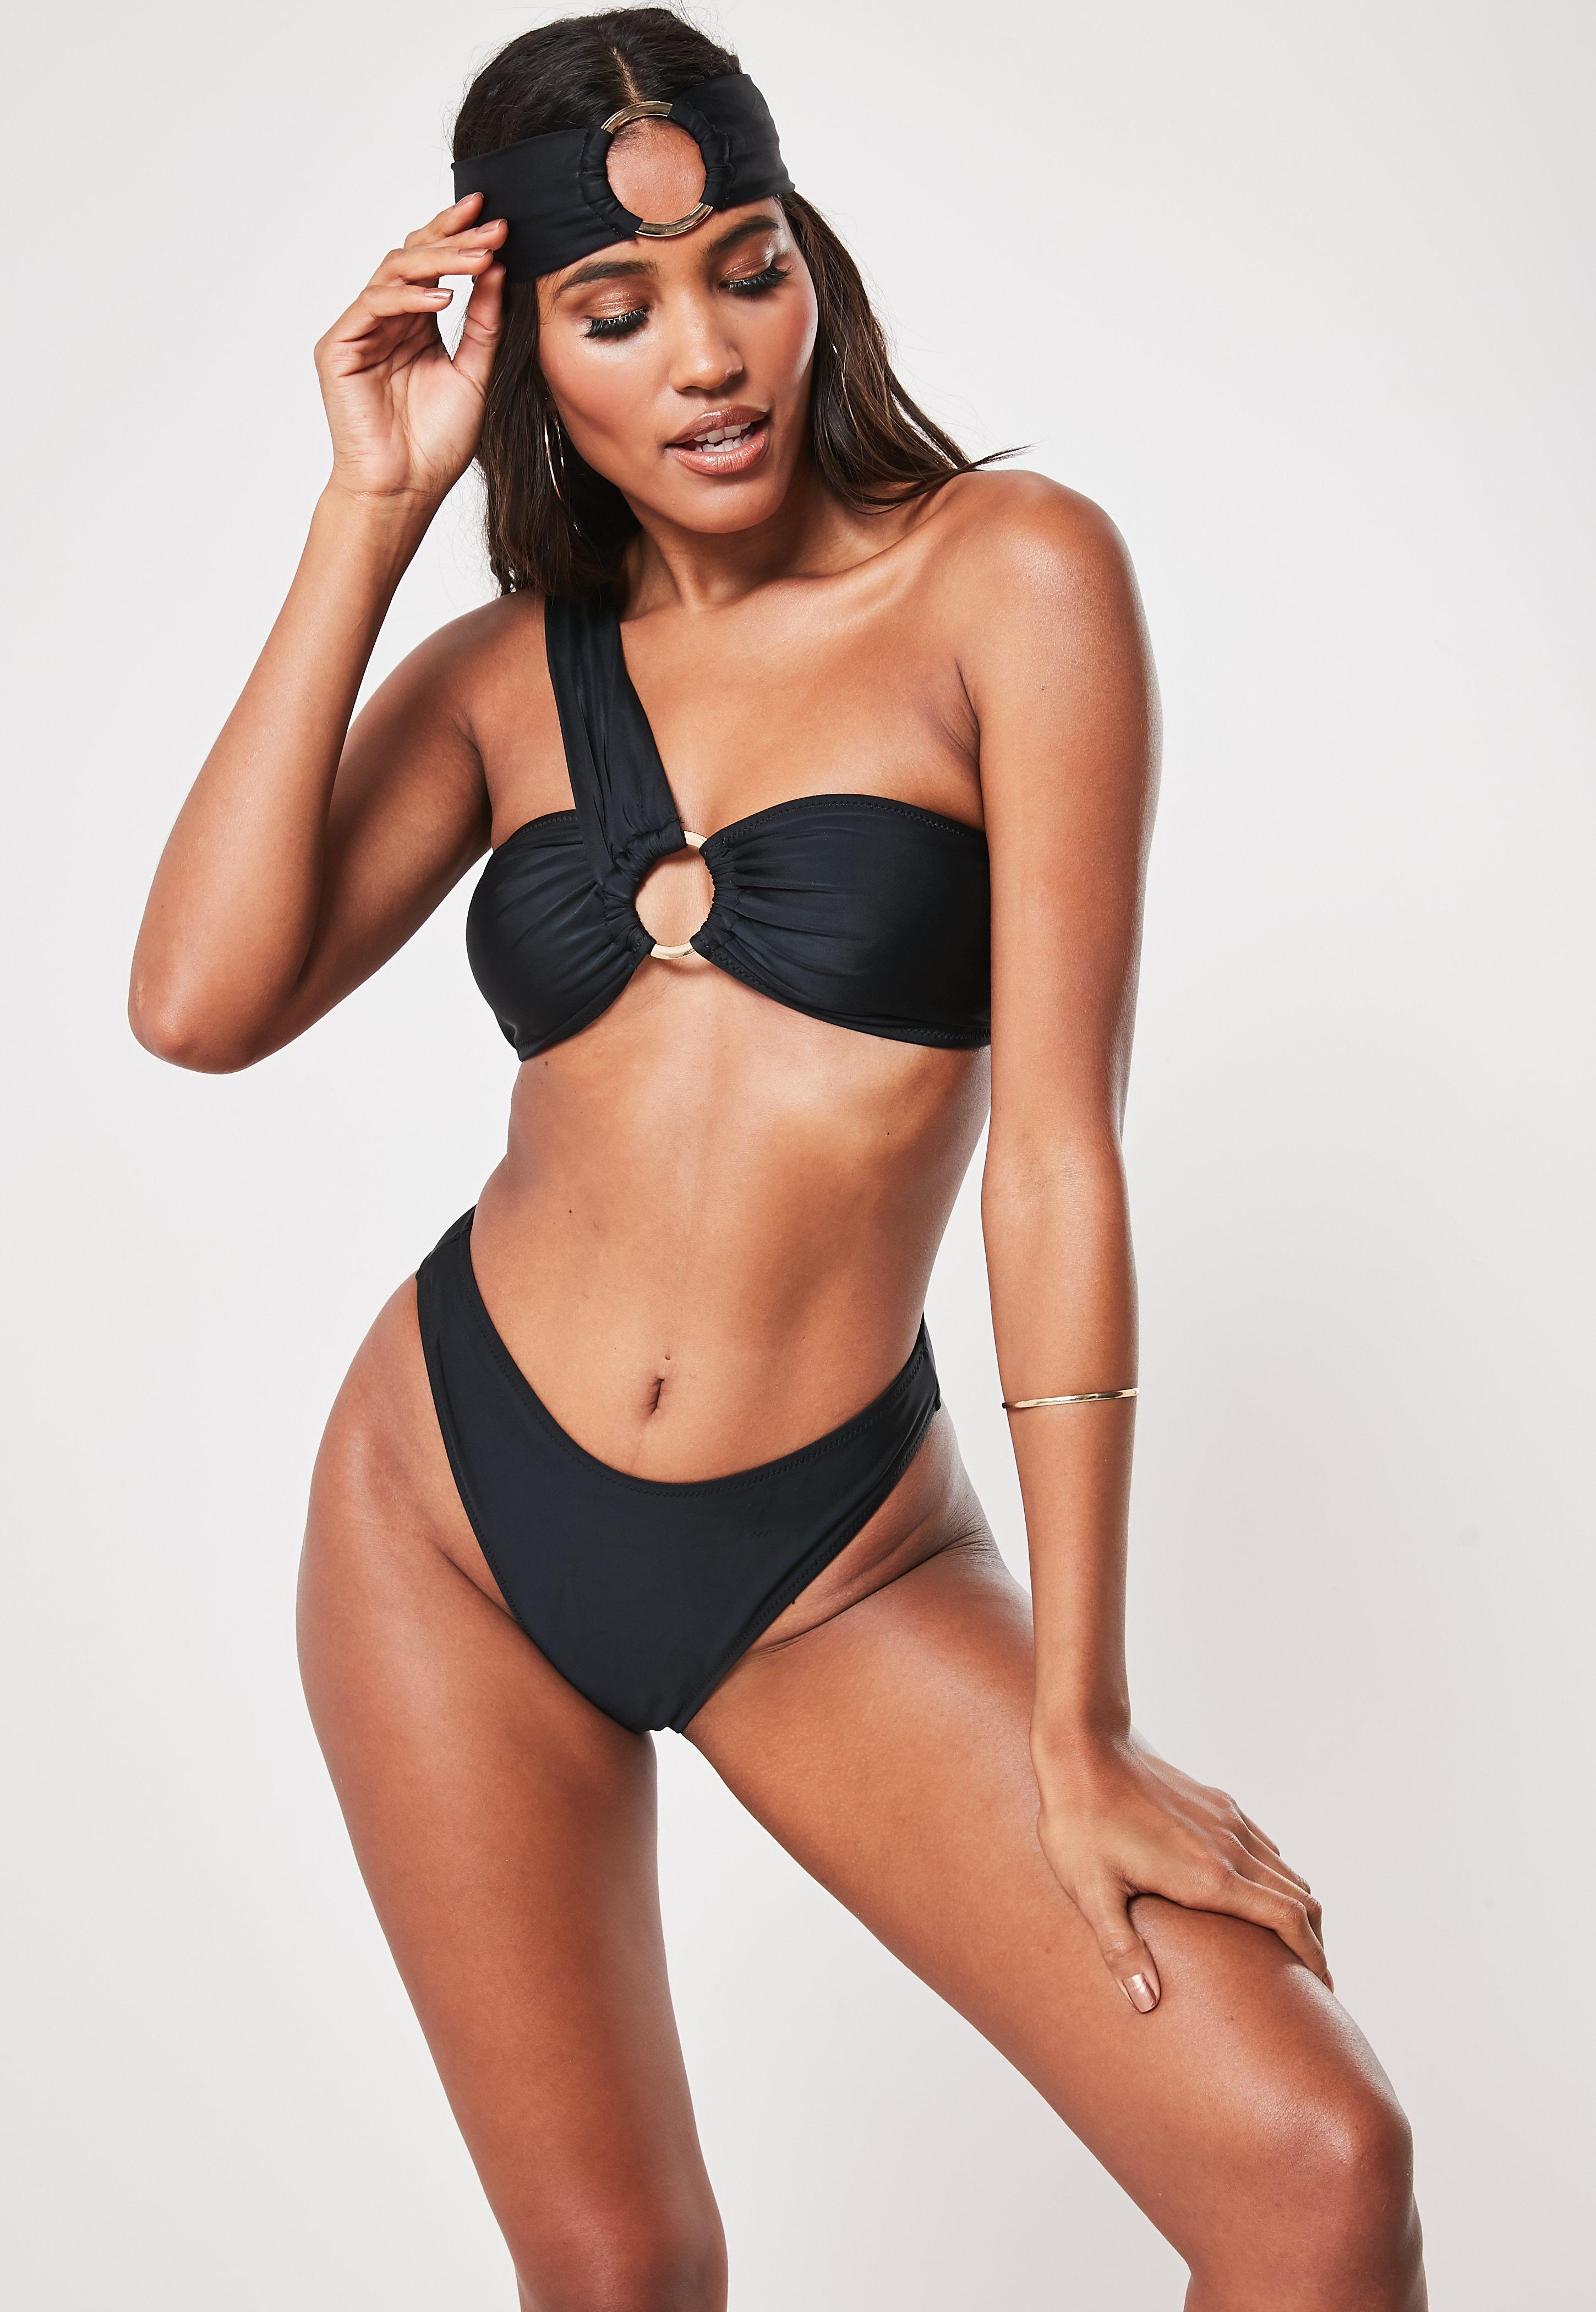 modèles de bikini Nude sexy fucken chatte noire